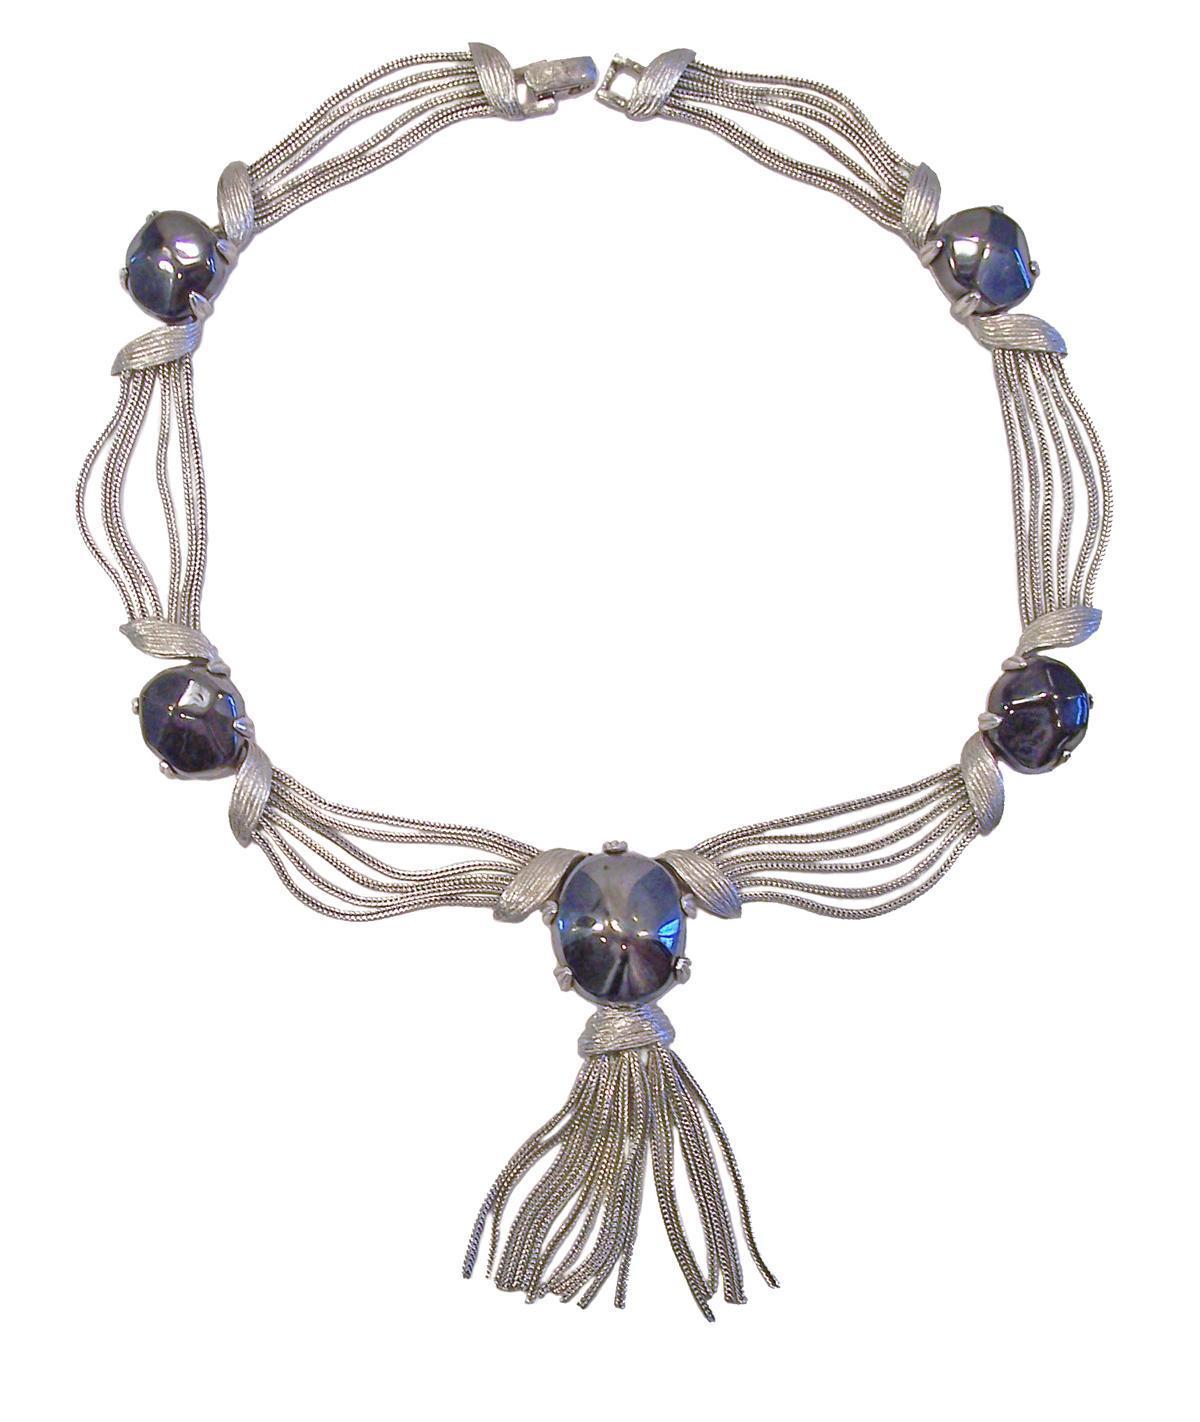 Vintage Hematite Glass Silver Tone Festoon Fringe Necklace